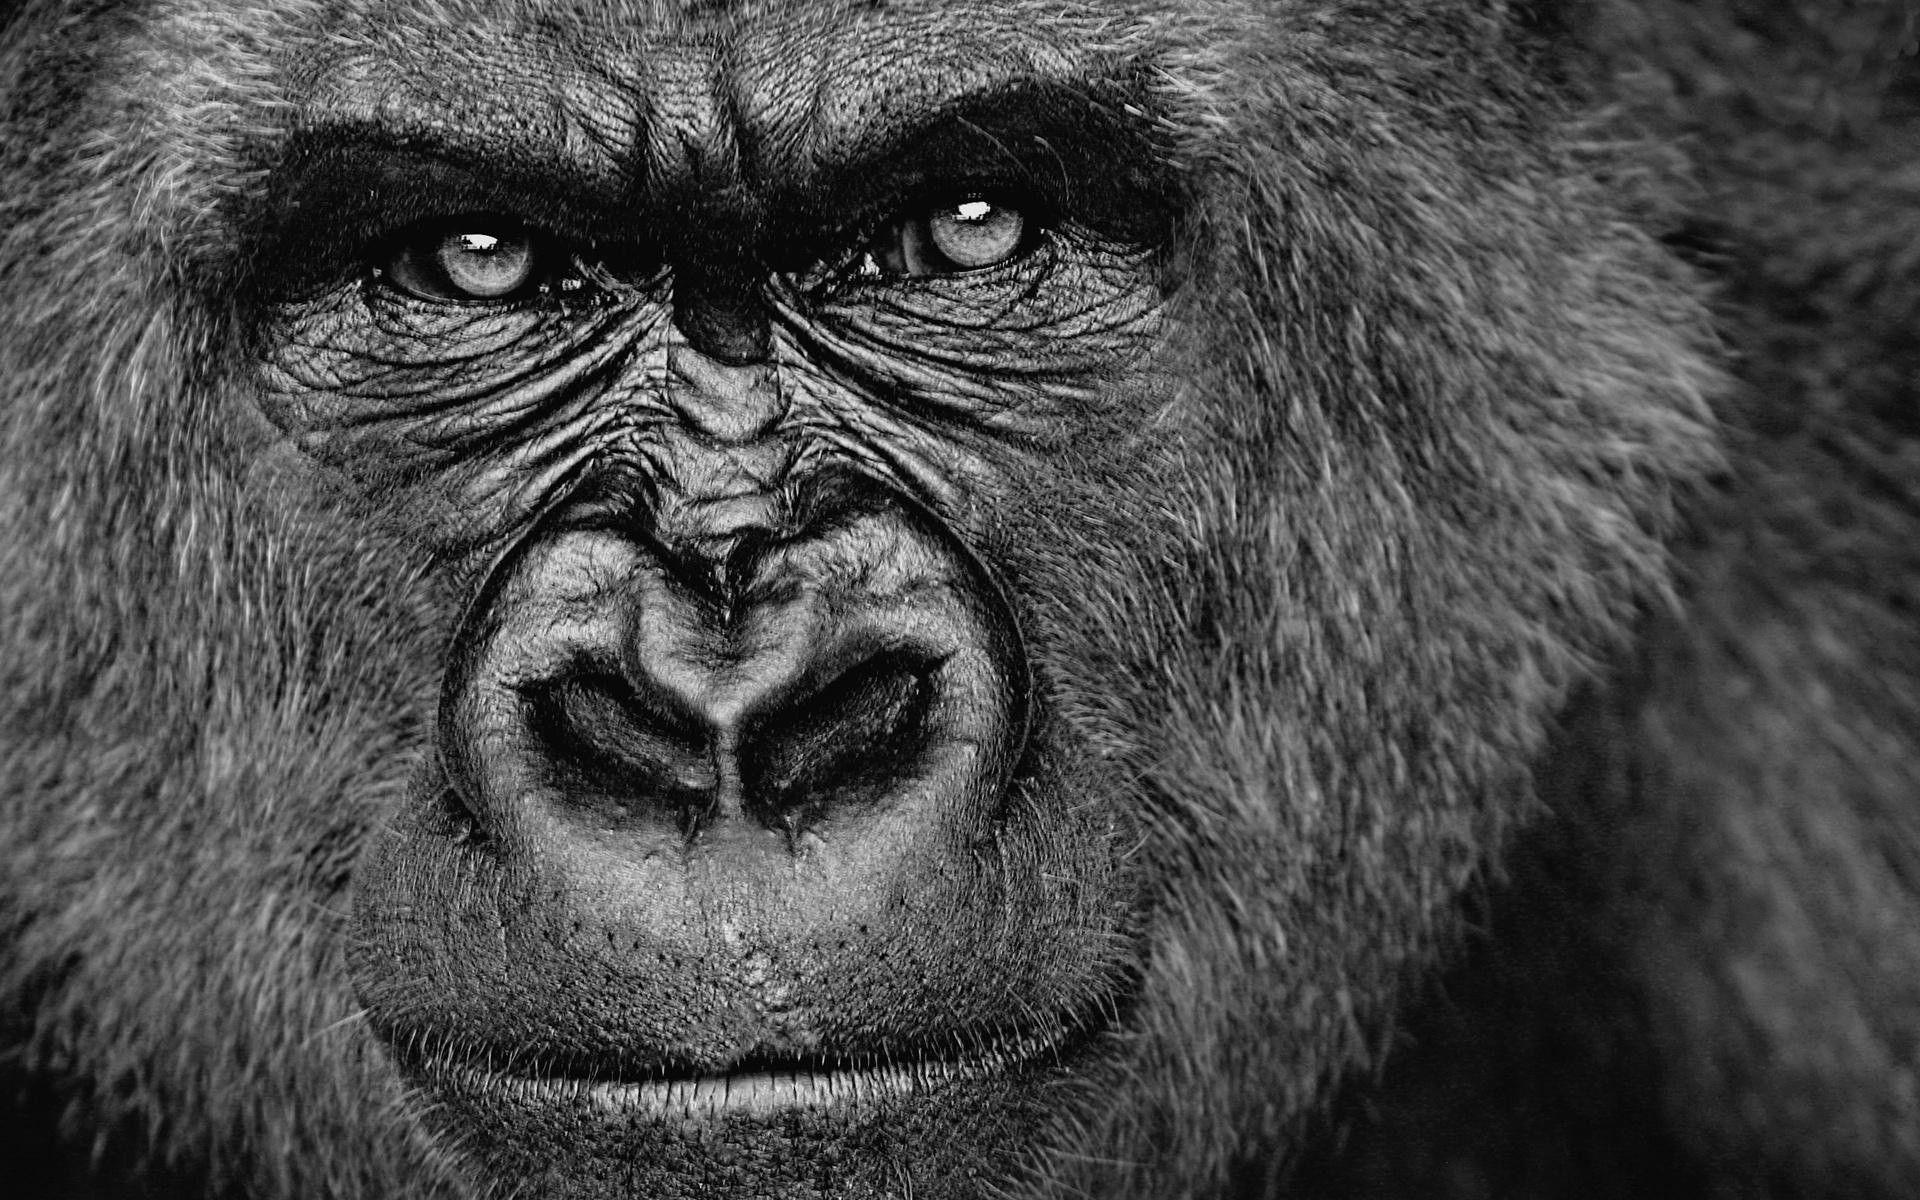 Gorilla Wallpapers 1920x1200